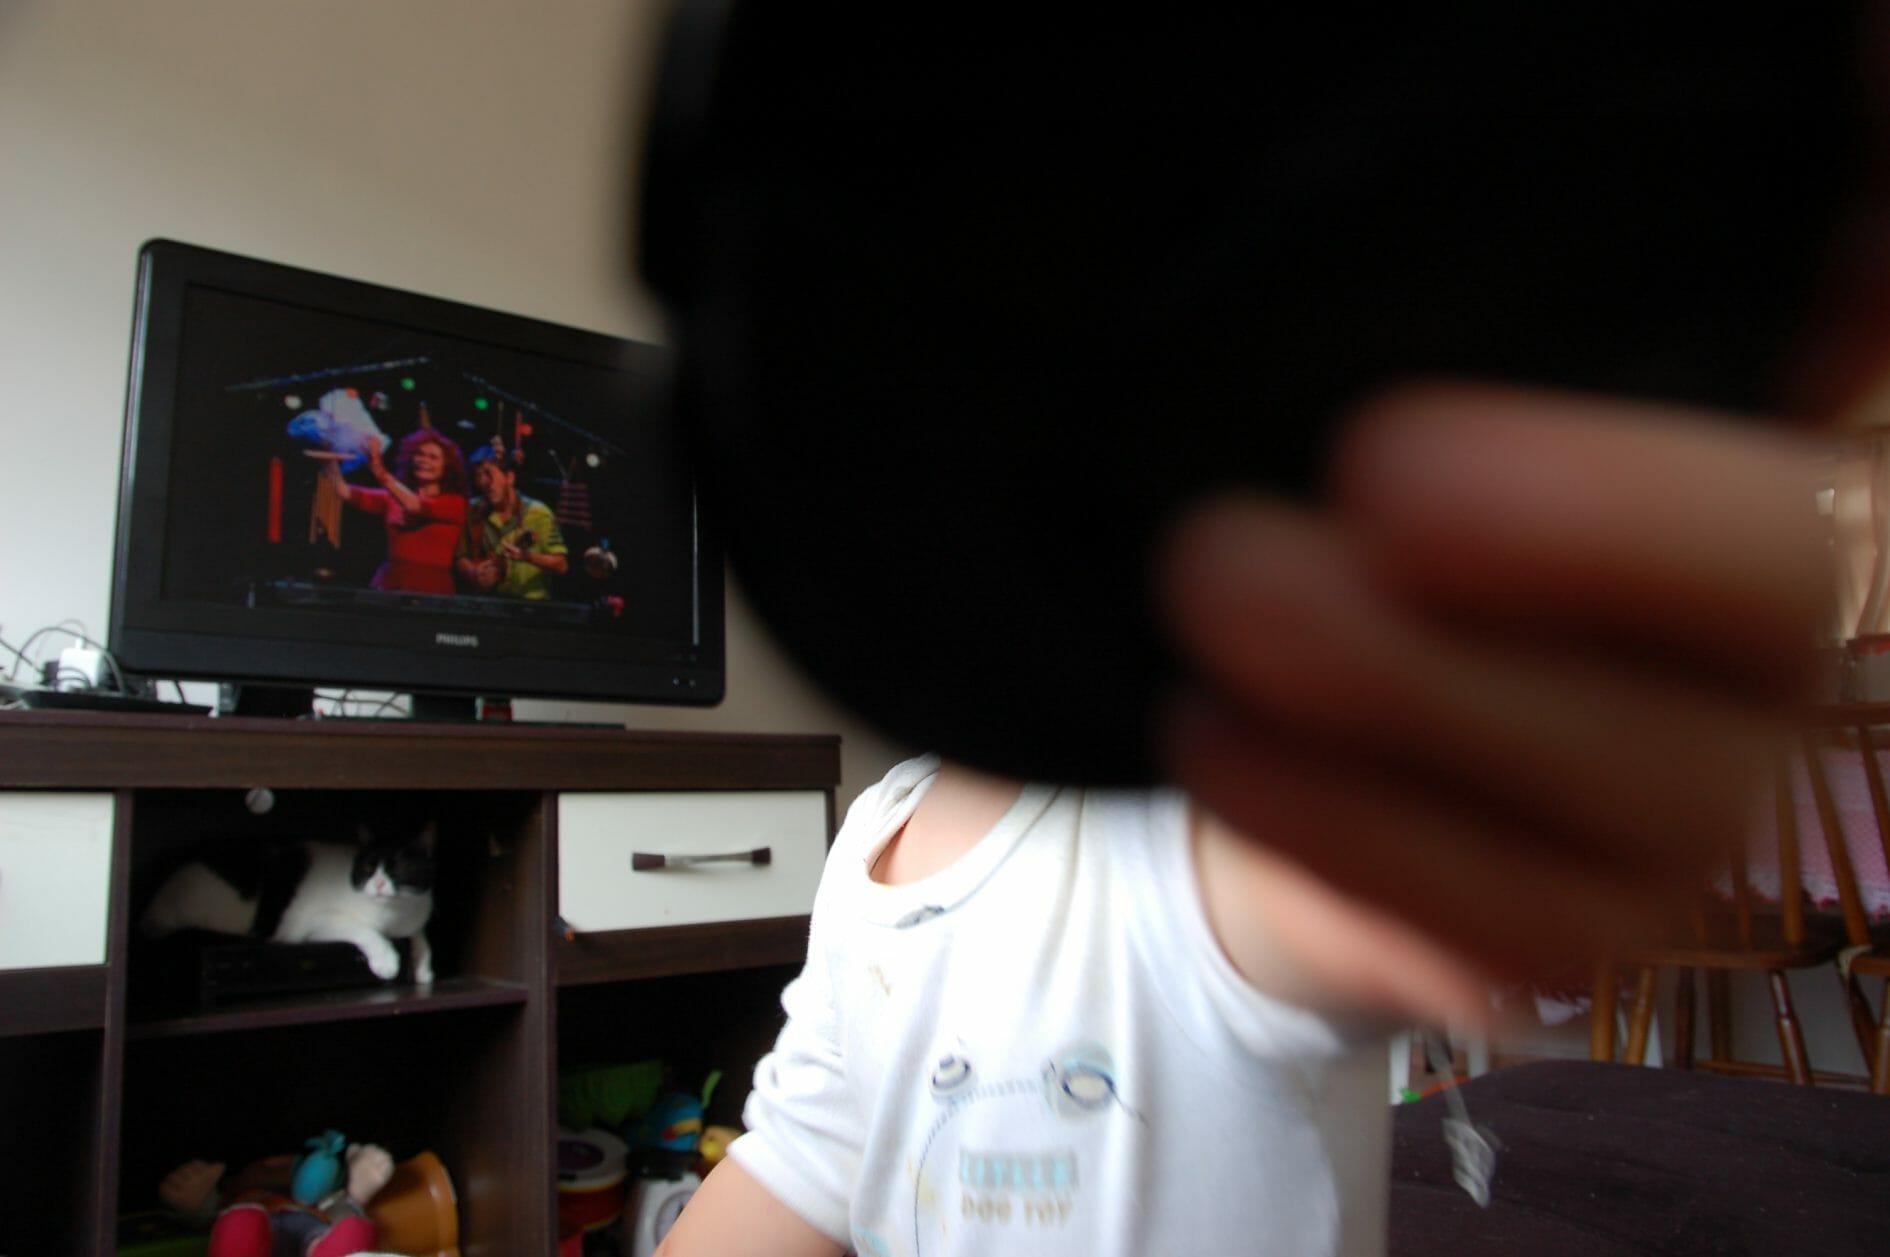 como substituimos a tv convencional por youtube